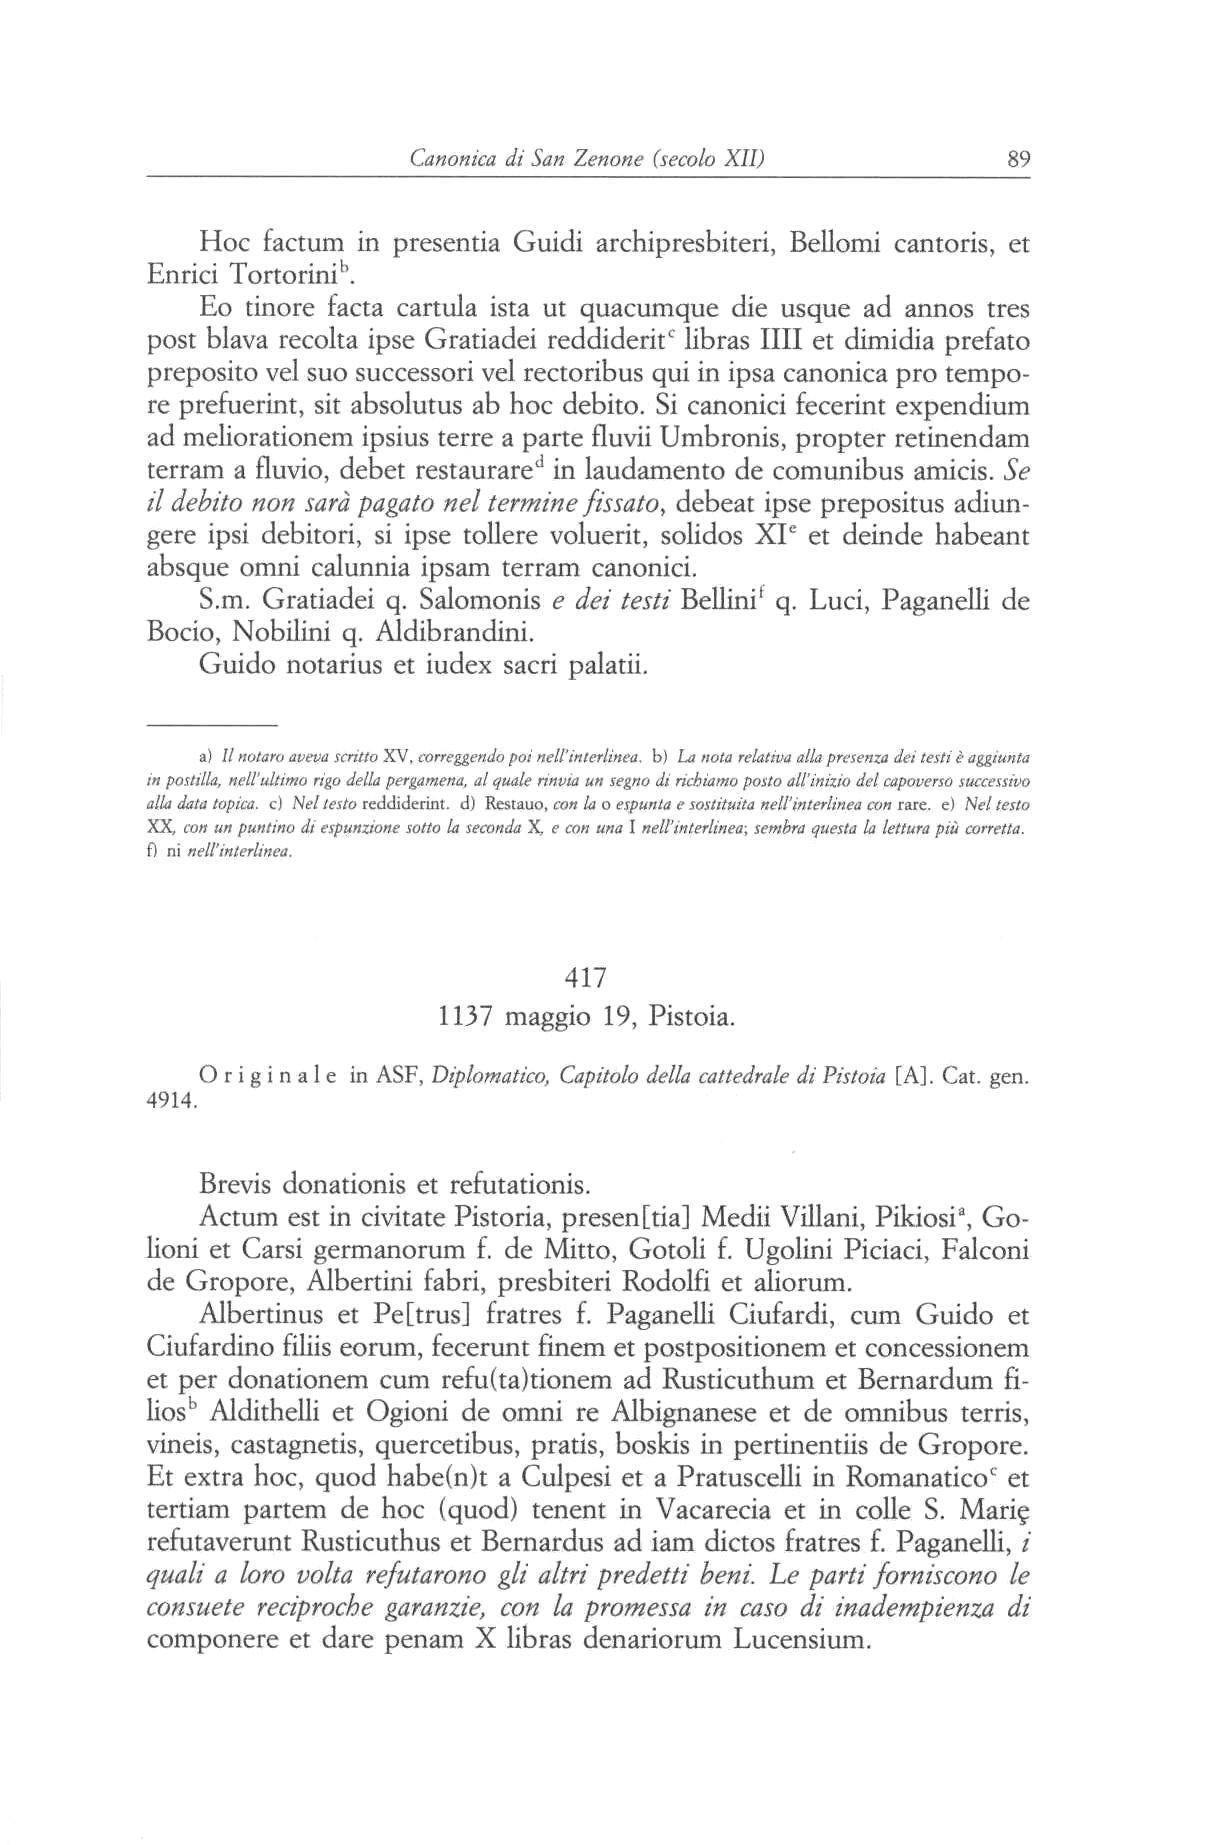 Canonica S. Zenone XII 0089.jpg